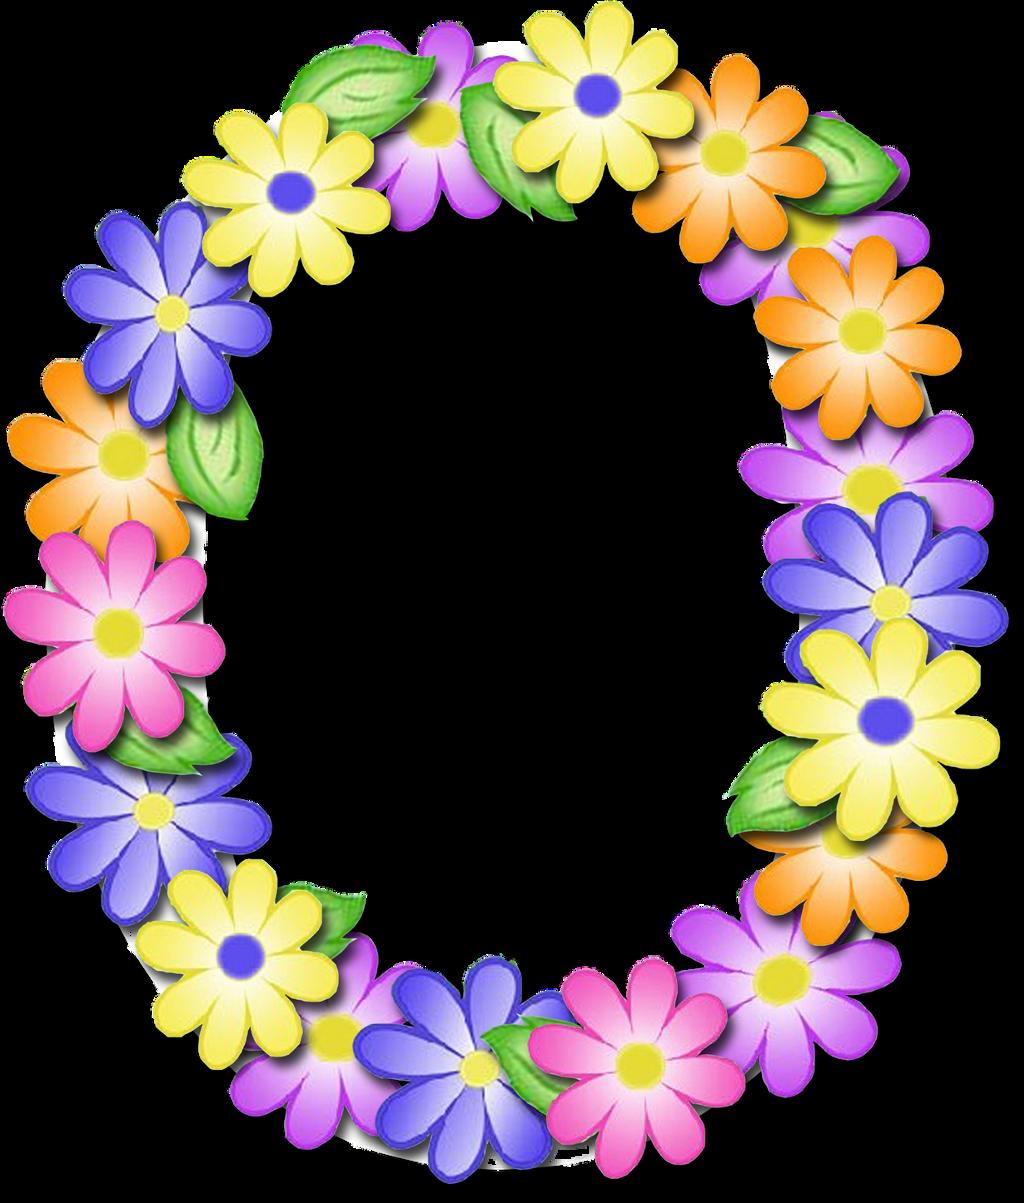 #flowers #frame